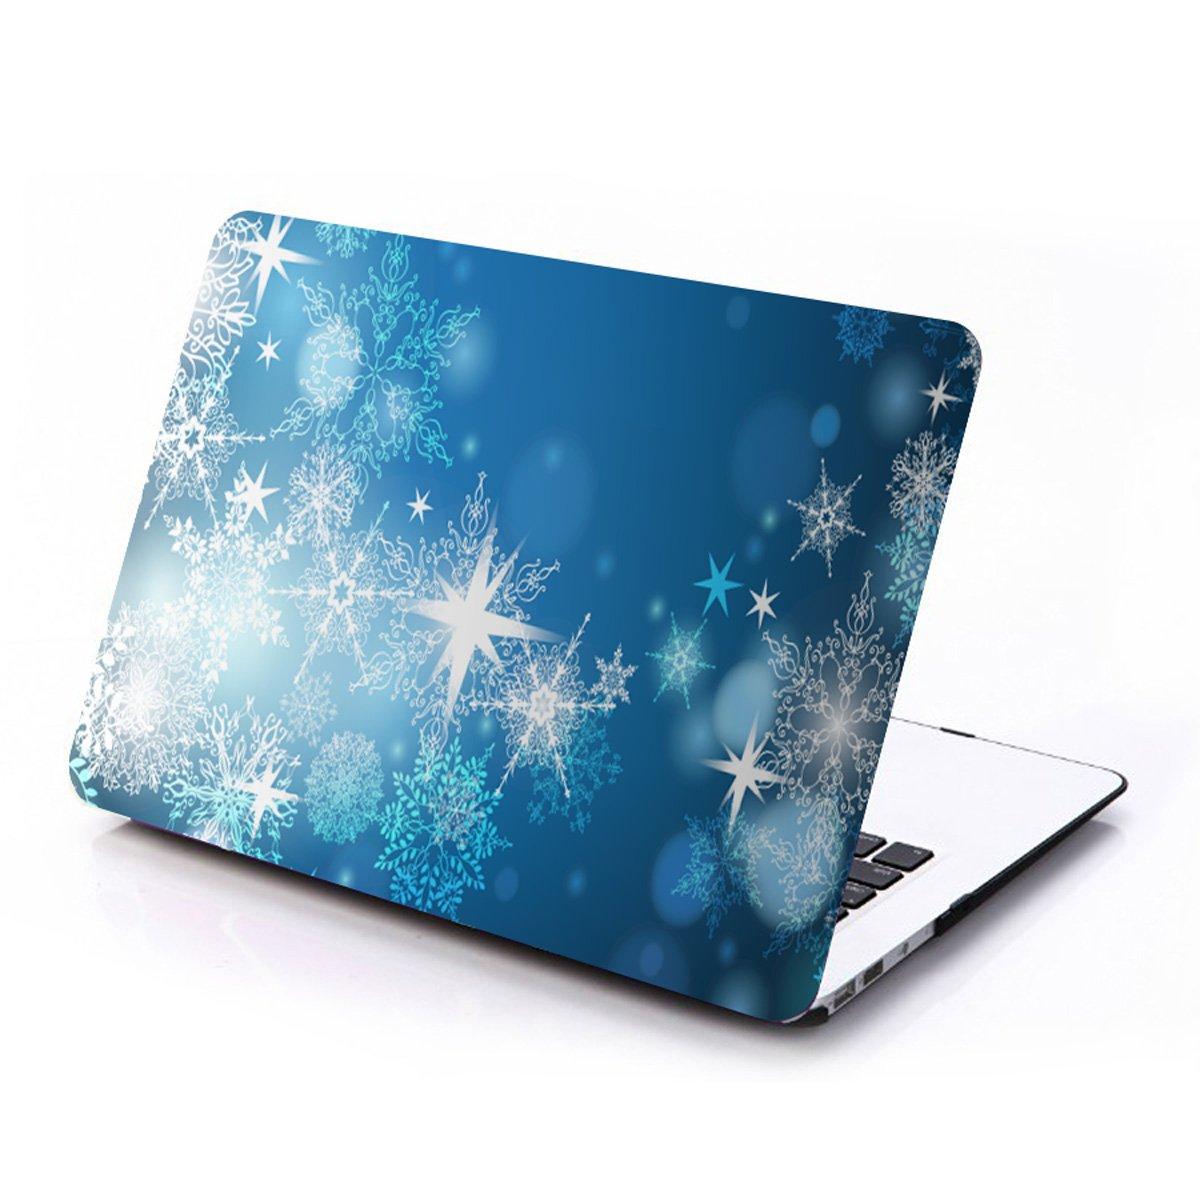 【Mac Book 12インチ マックブック 12インチ】 デザイン シェルカバー シェルケース Macbook Pro 13 ケース Air 11 13 Retina Display マックブック B018S3K51Y Macbook 12インチ|COLOR07 COLOR07 Macbook 12インチ